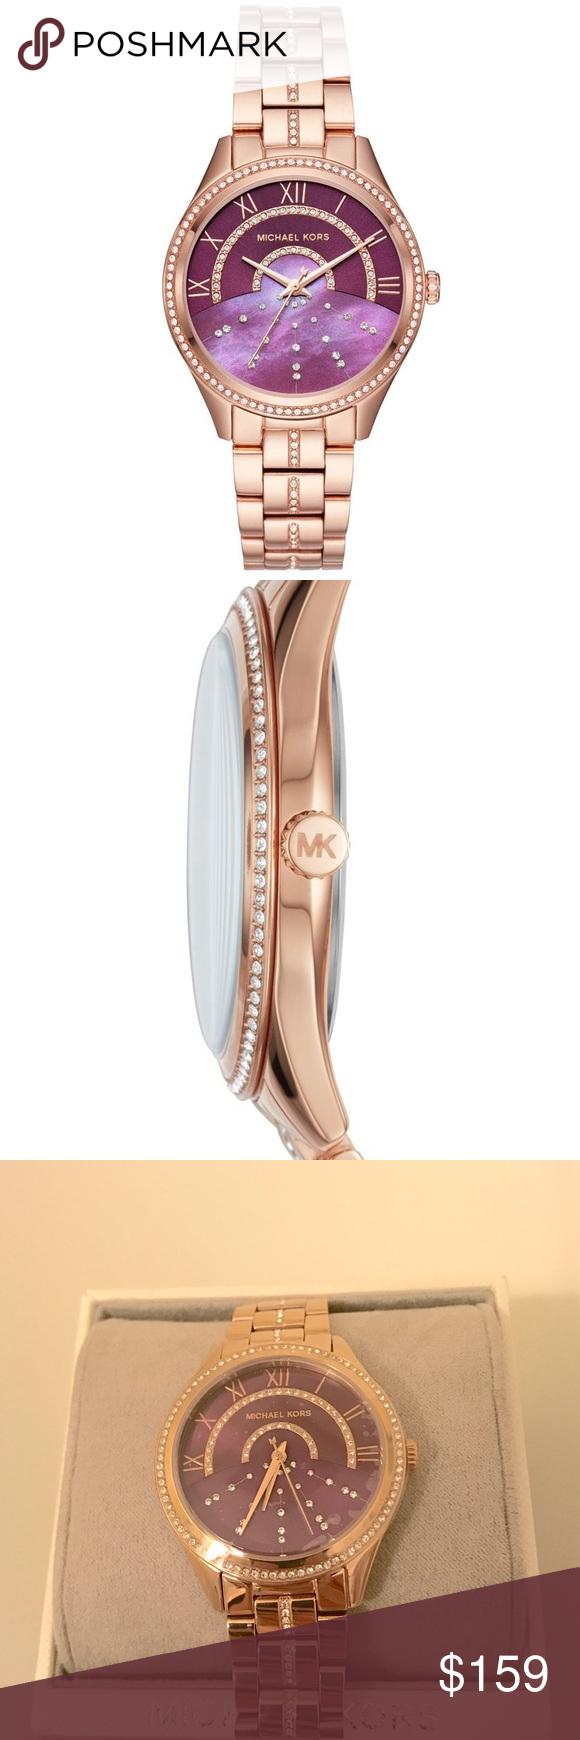 4cd928a01a77 Michael Kors Lauryn Rose Gold-Tone Bracelet Watch Michael Kors Women s  Lauryn Rose Gold-